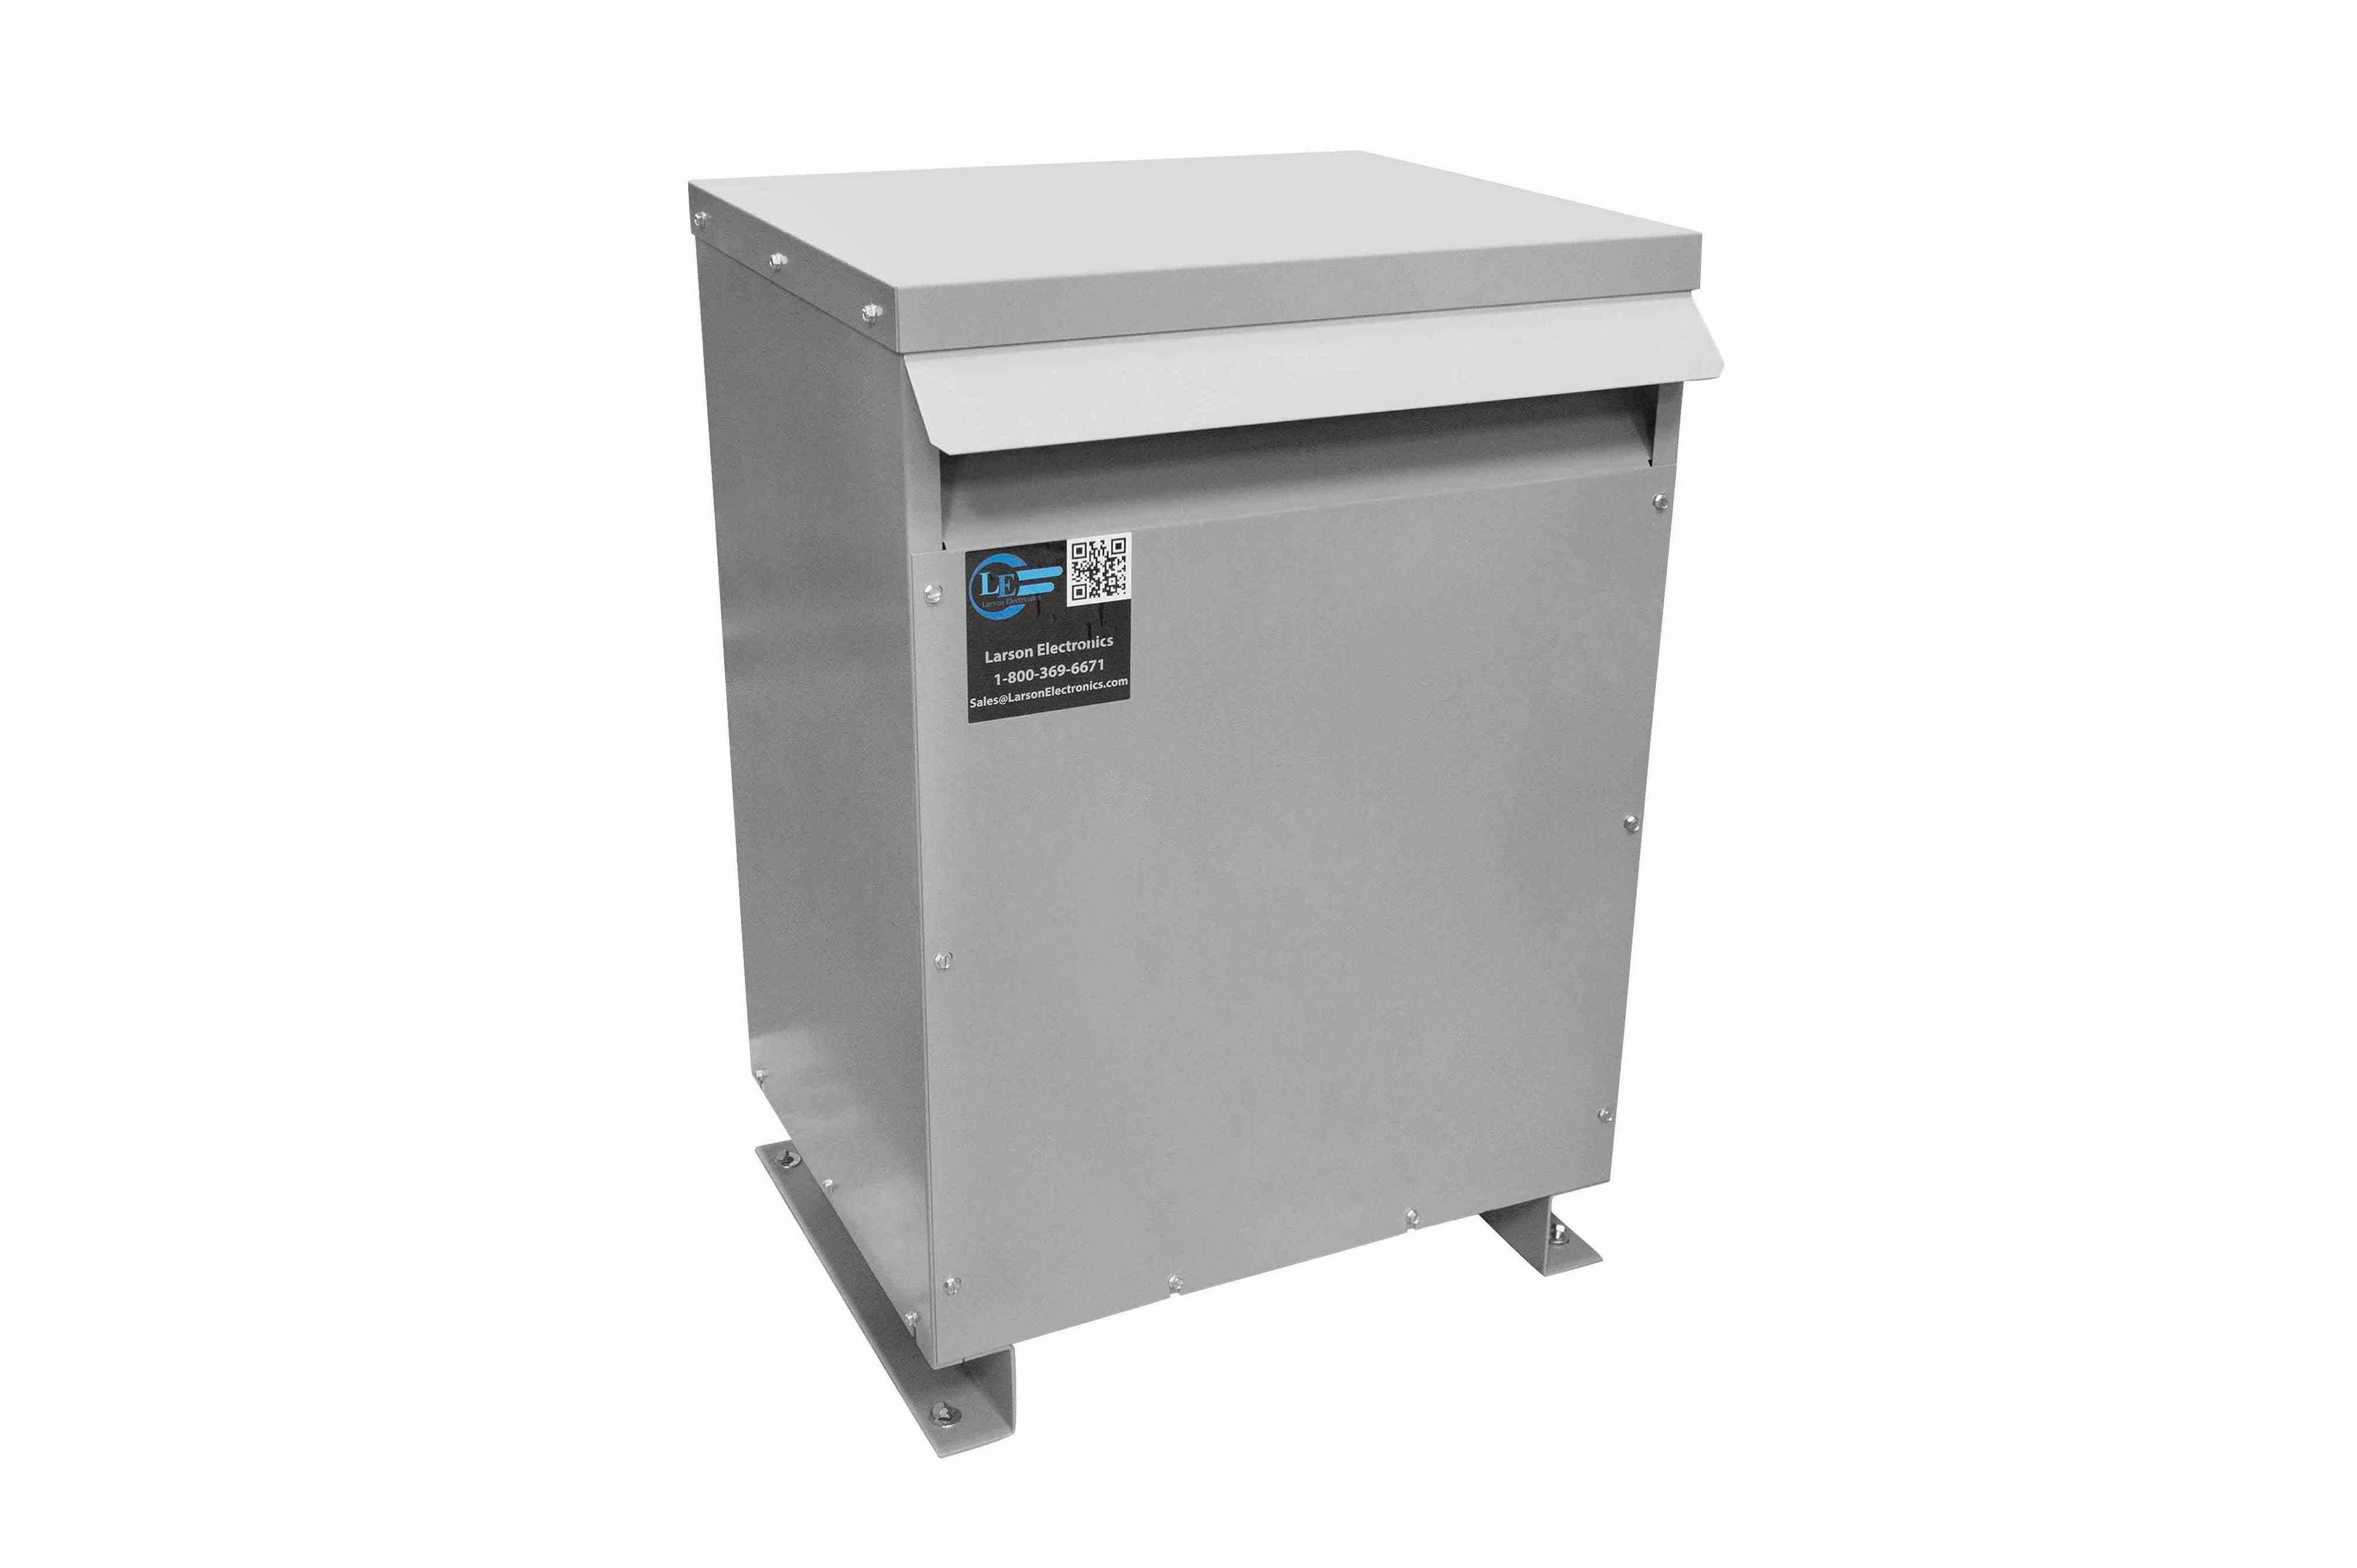 115 kVA 3PH Isolation Transformer, 400V Wye Primary, 240V/120 Delta Secondary, N3R, Ventilated, 60 Hz